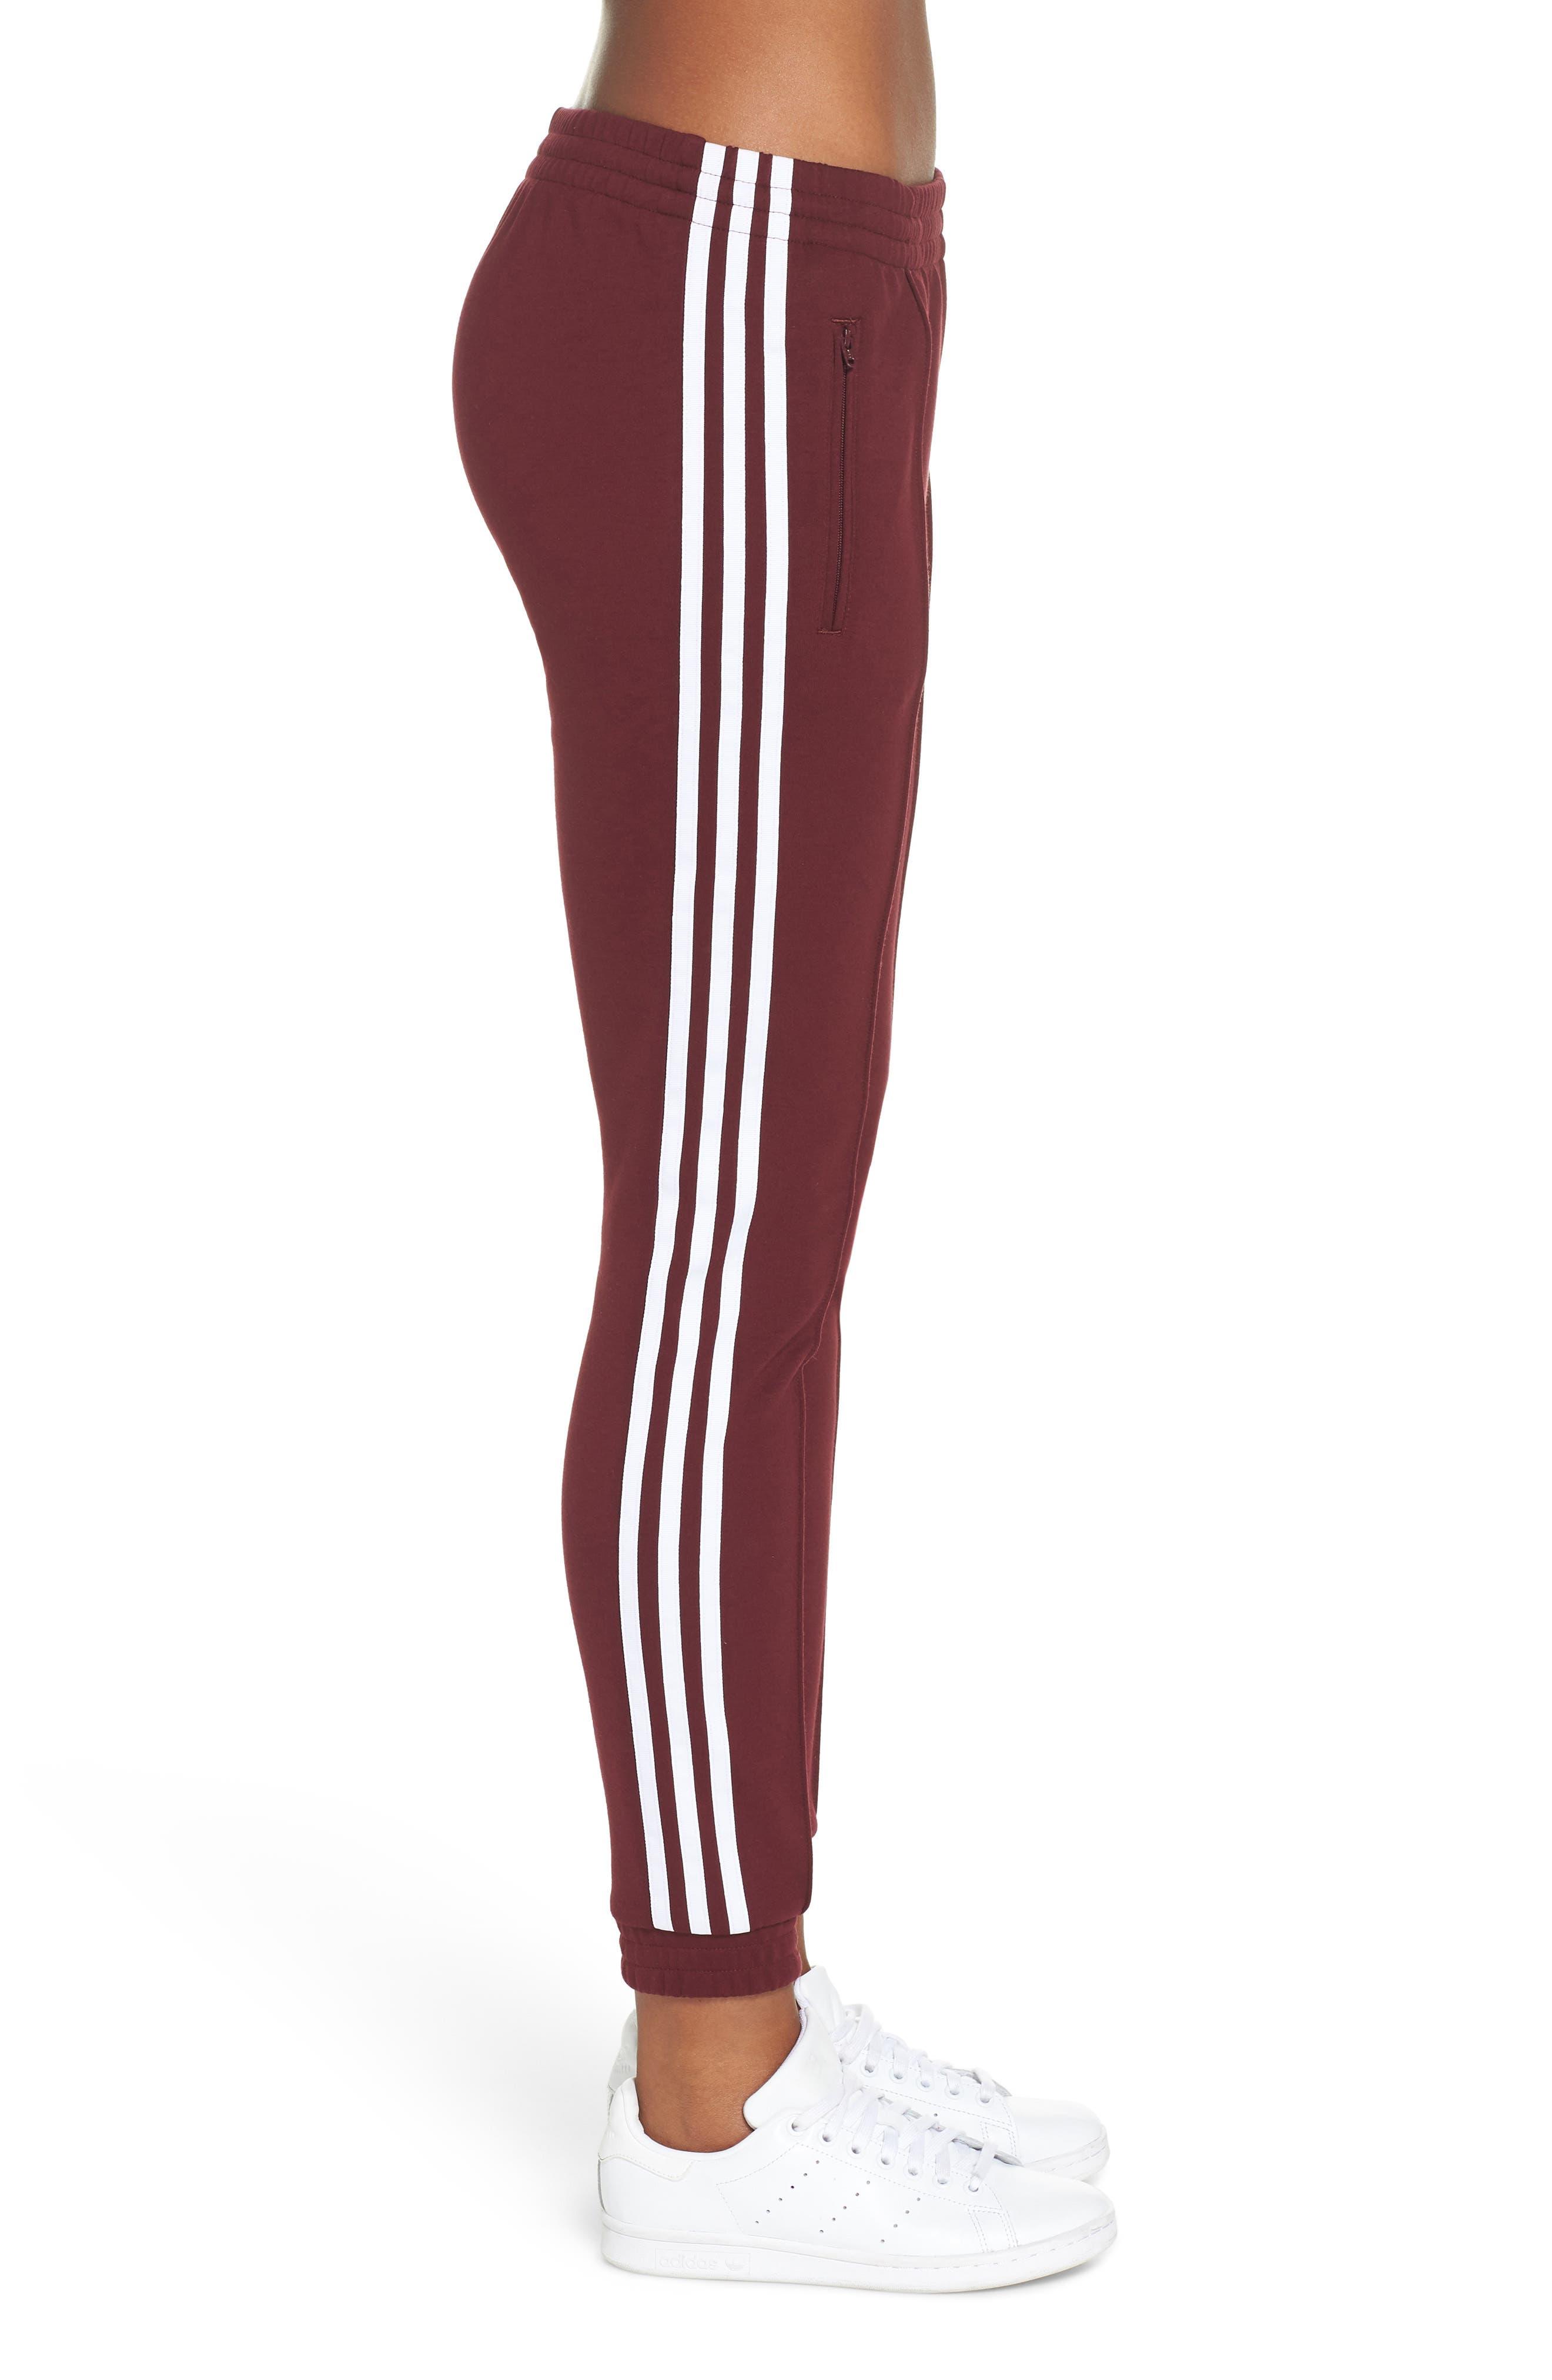 ADIDAS ORIGINALS,                             SST Track Pants,                             Alternate thumbnail 3, color,                             930